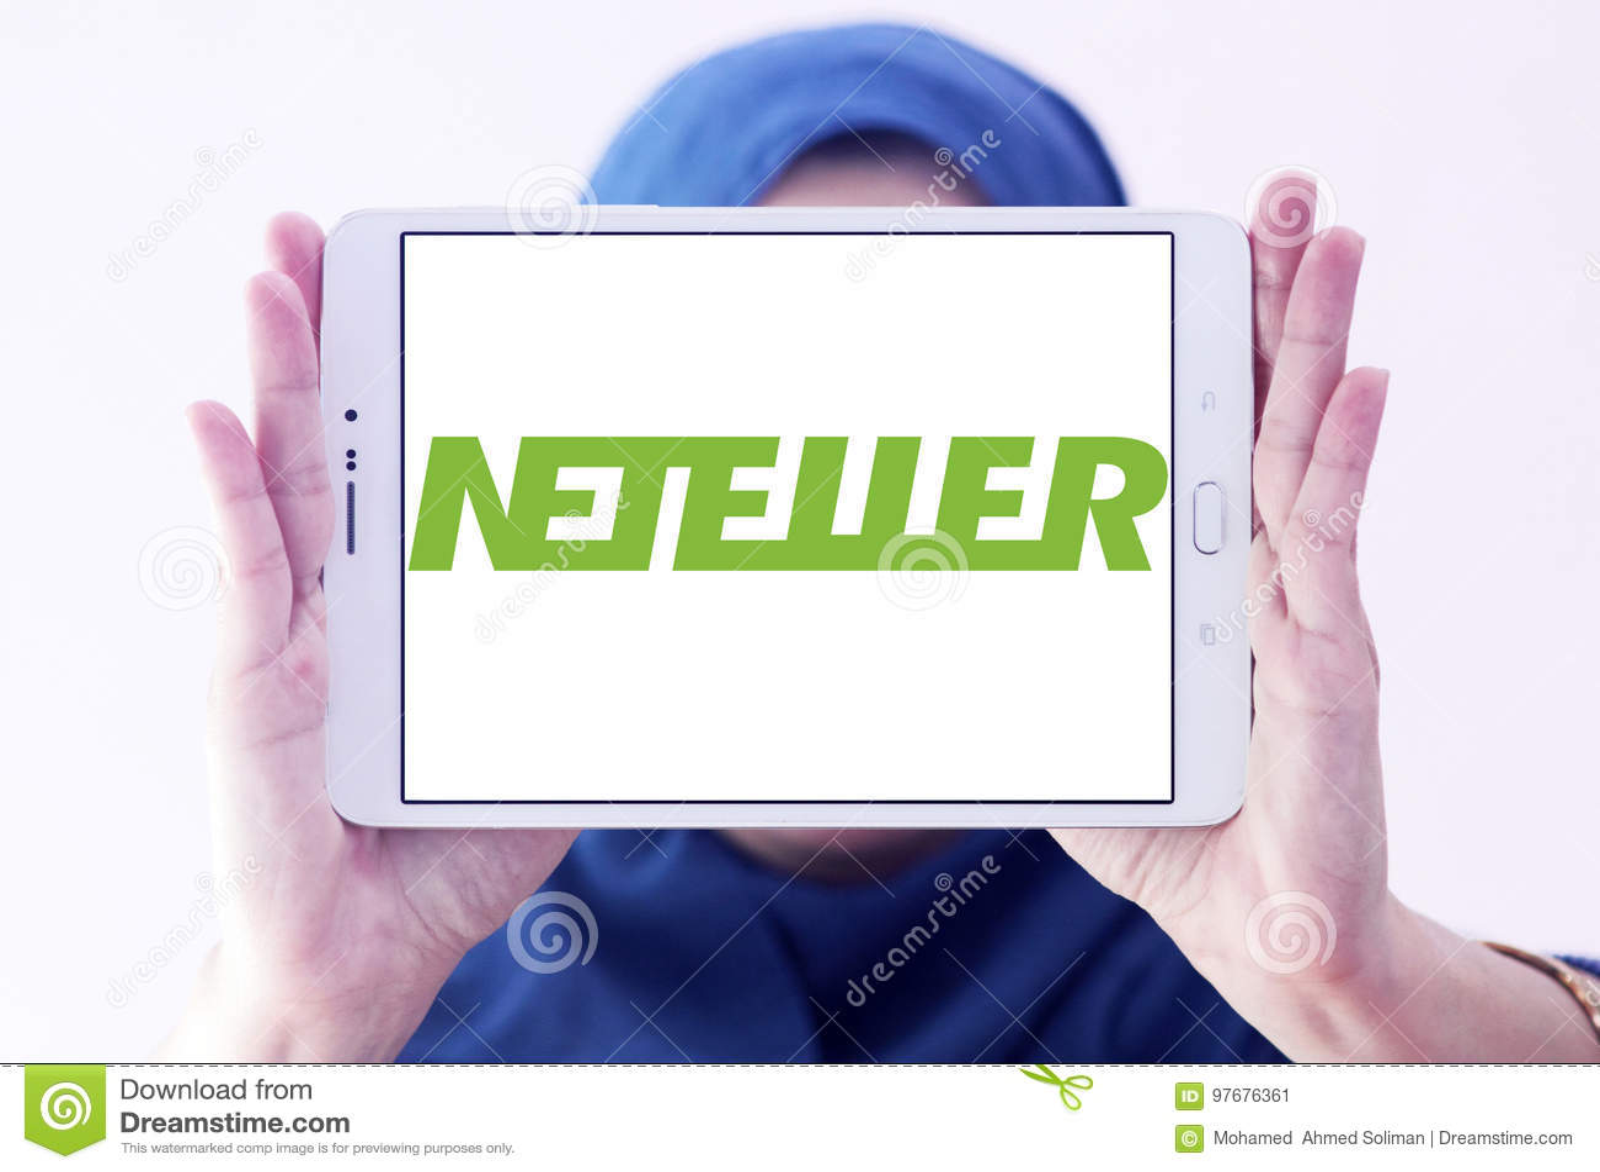 Neteller Bank